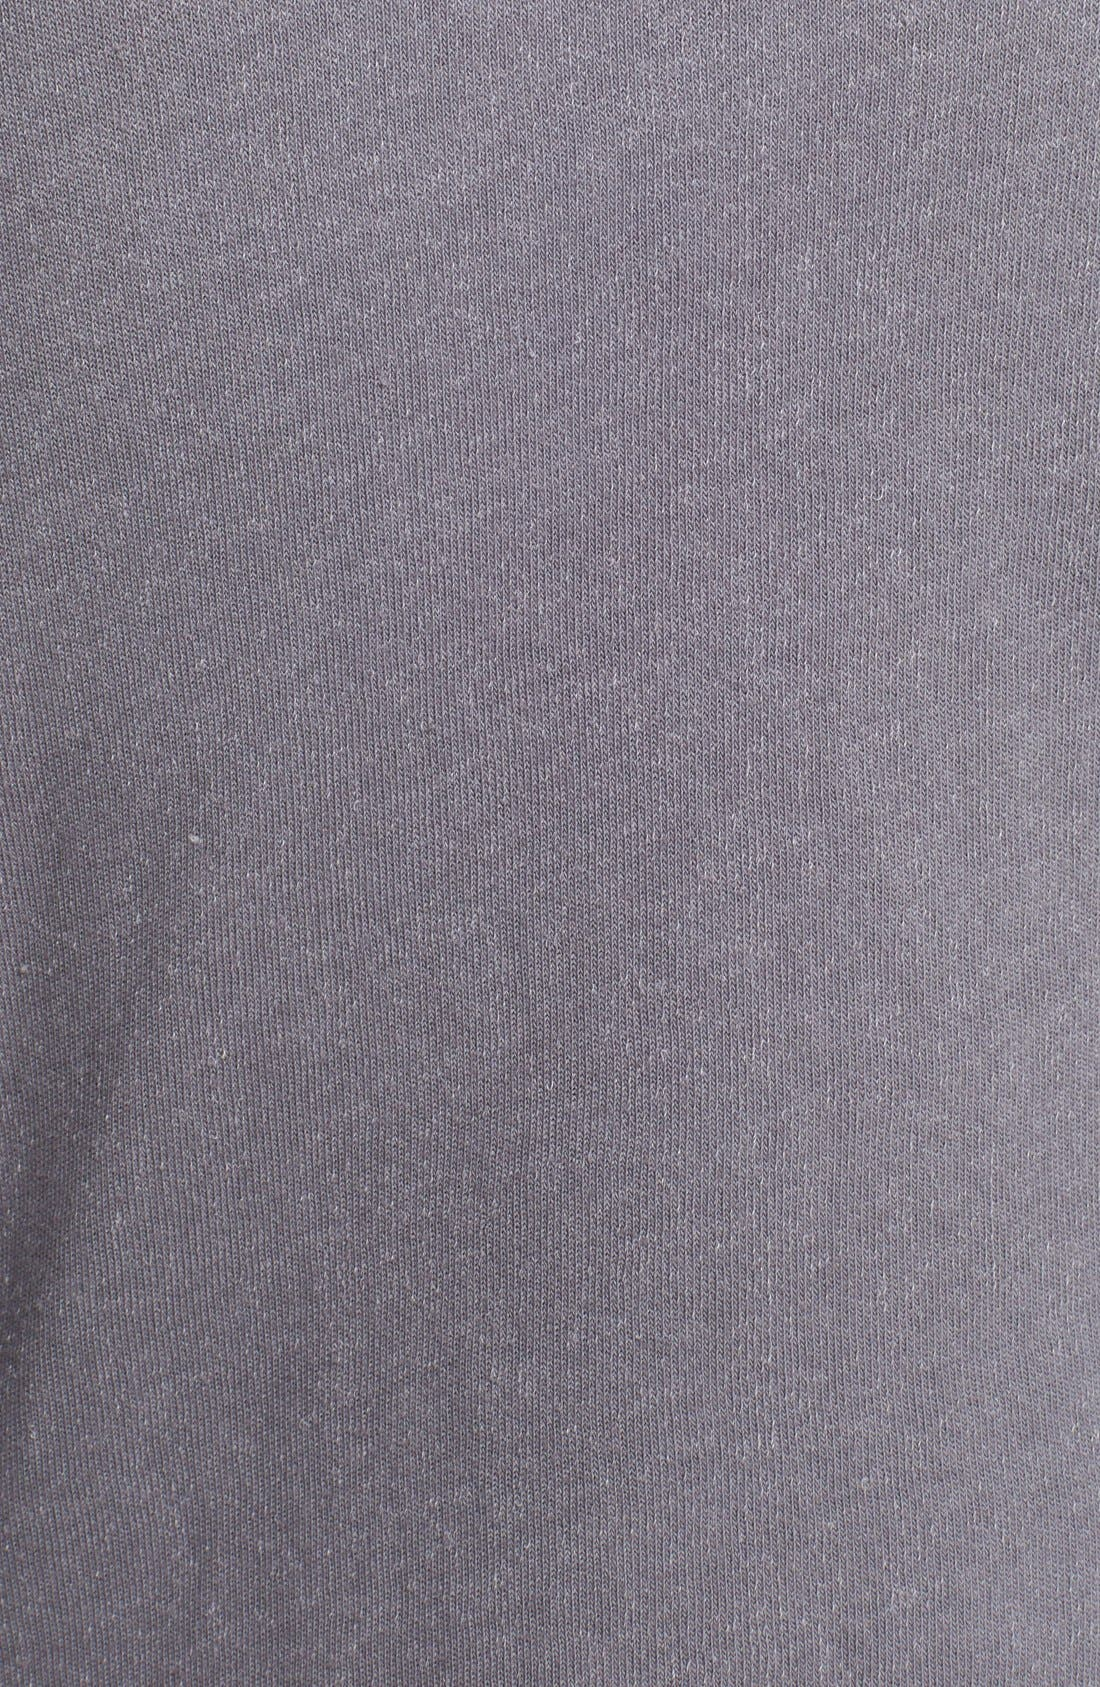 Alternate Image 3  - Rodarte Hooded Sweatshirt